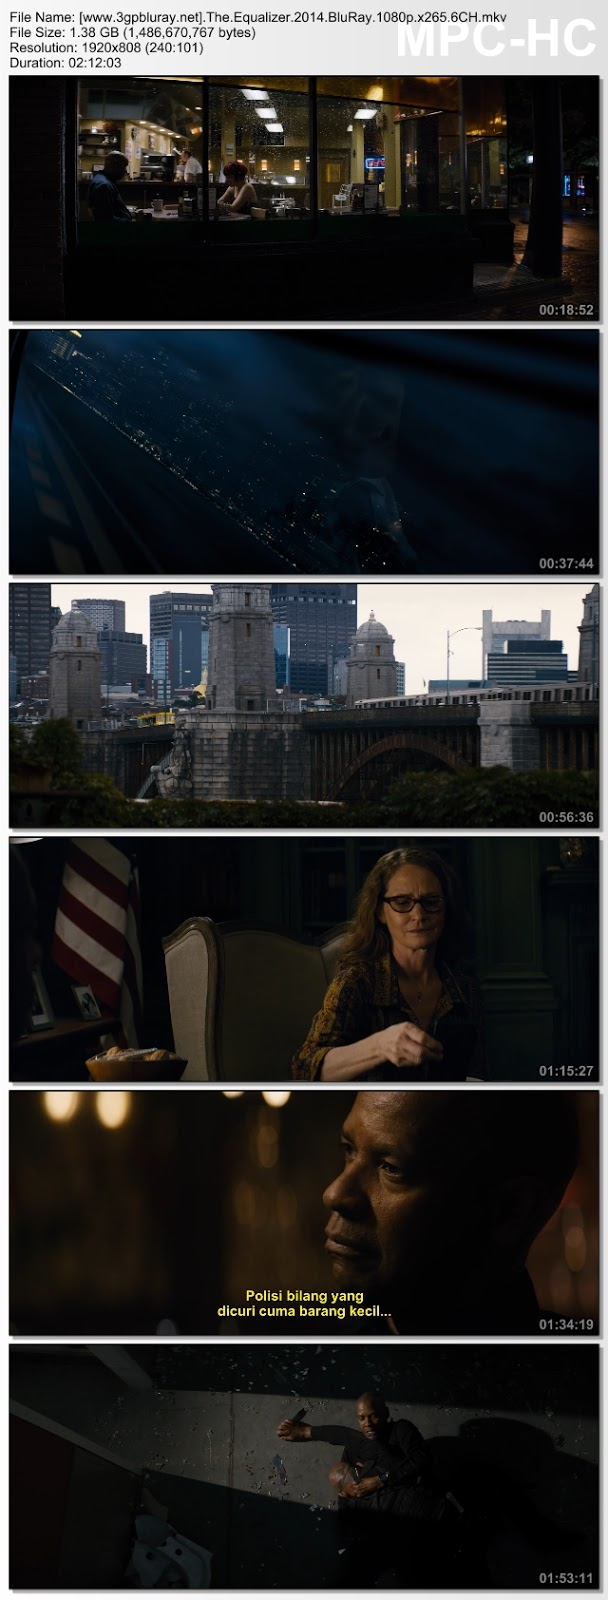 Screenshots Download Film Gratis Hardsub Indo The Equalizer (2014) BluRay 480p MP4 Subtitle Bahasa Indonesia 3GP